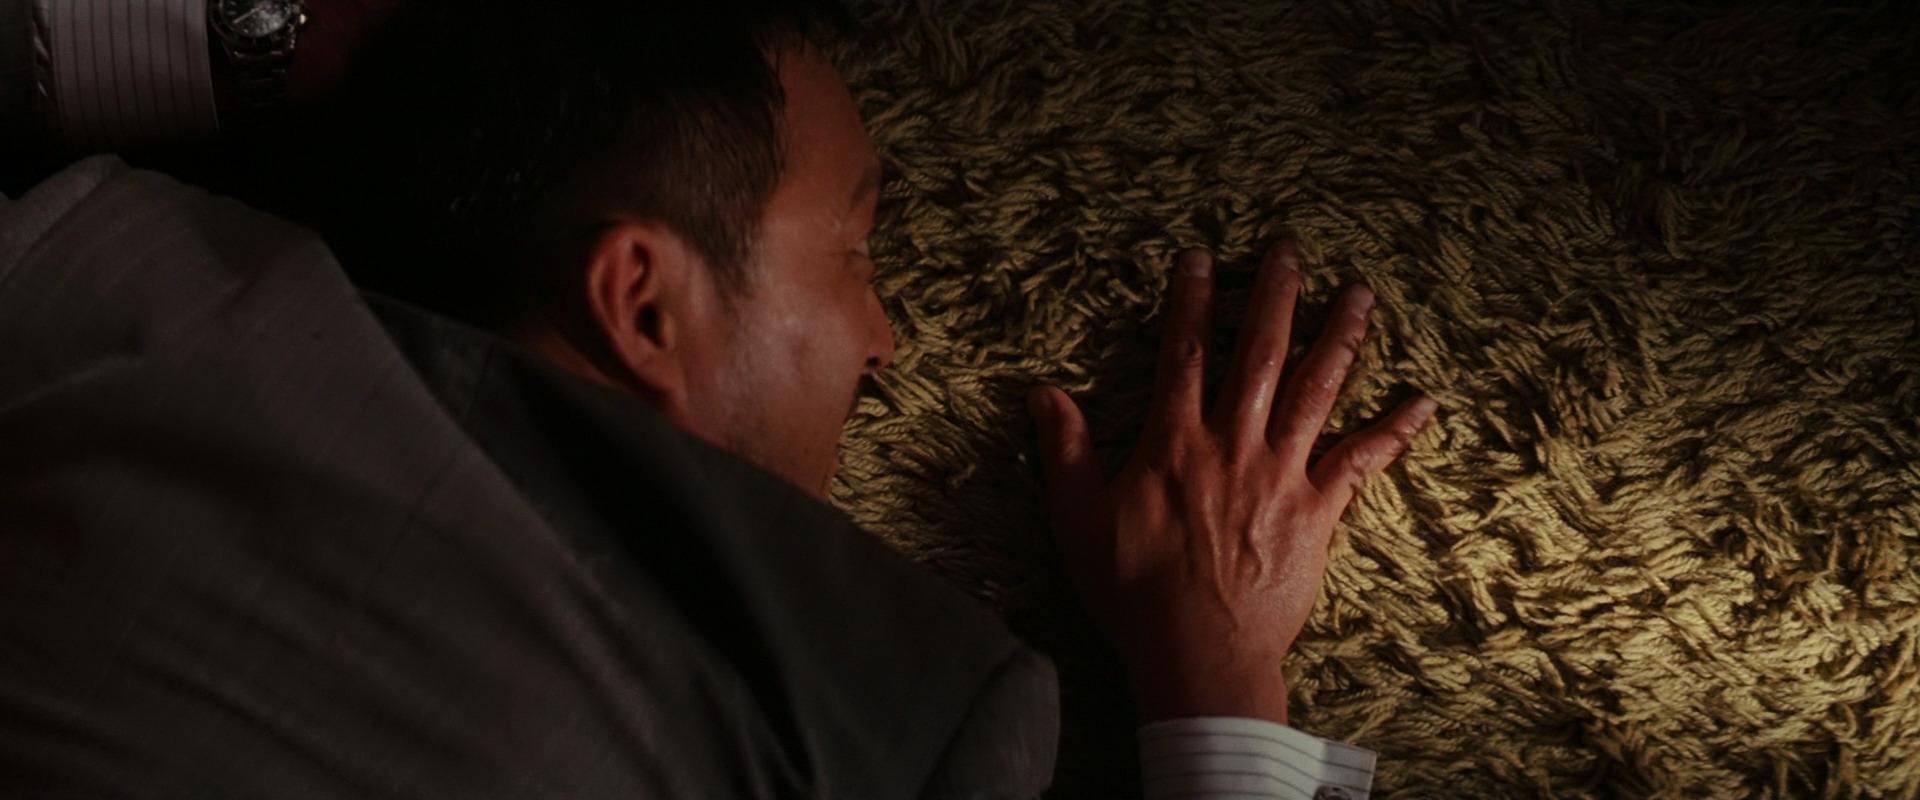 carpet png. saito carpet.png carpet png